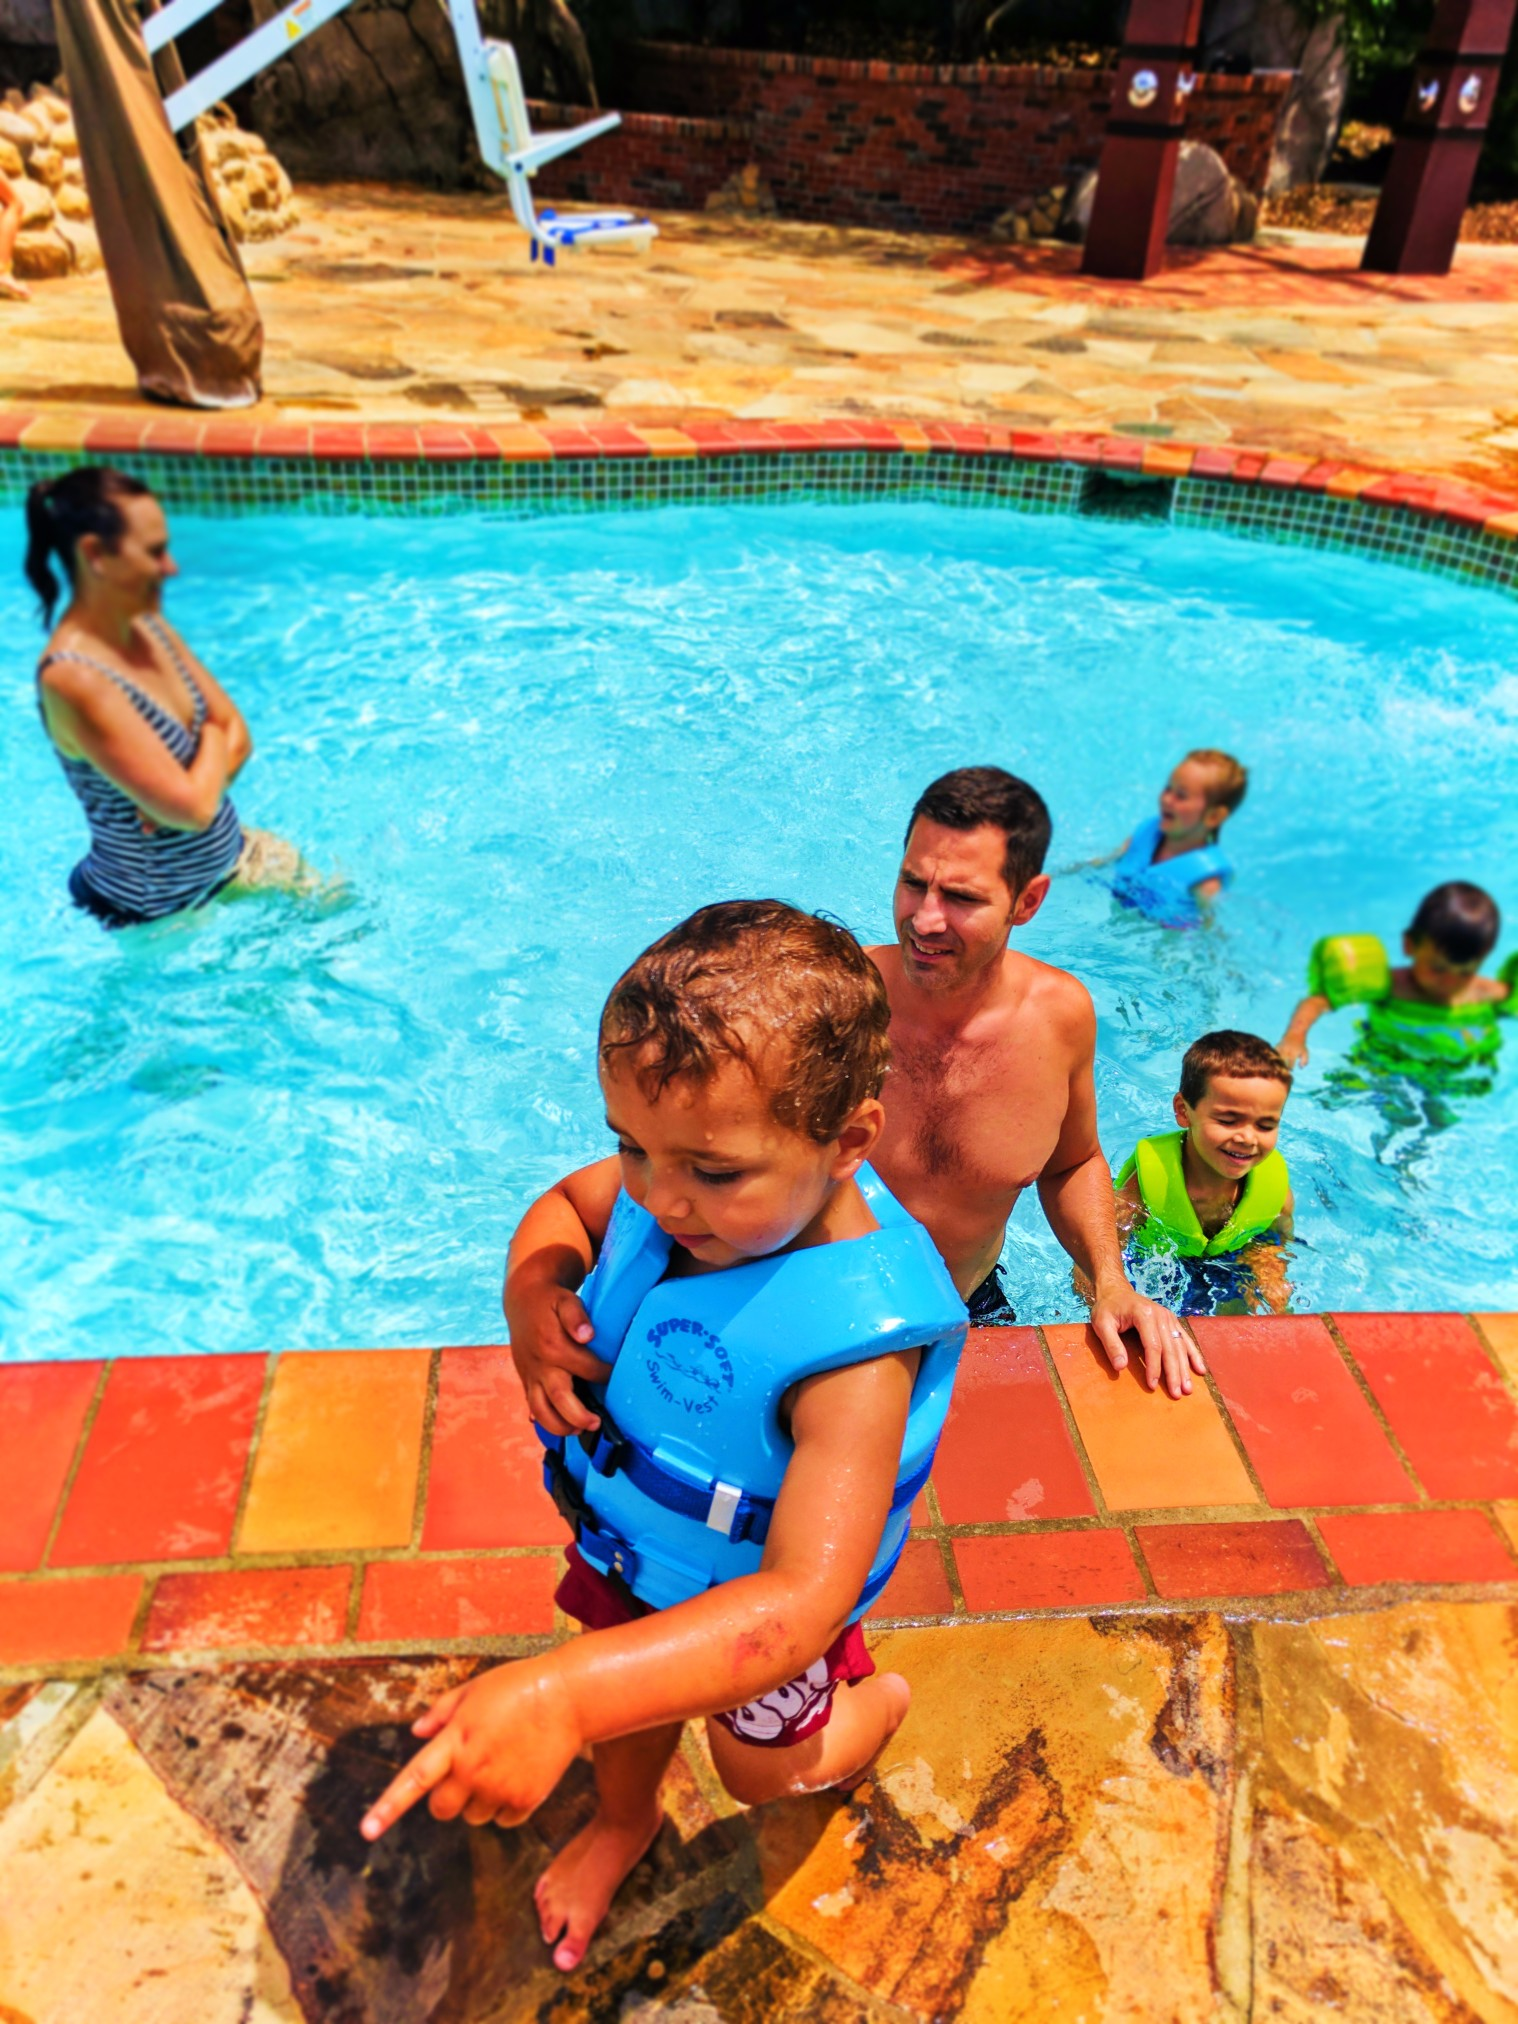 Taylor Family in waterslide pool at Disneys Grand Californian Hotel Disneyland 3